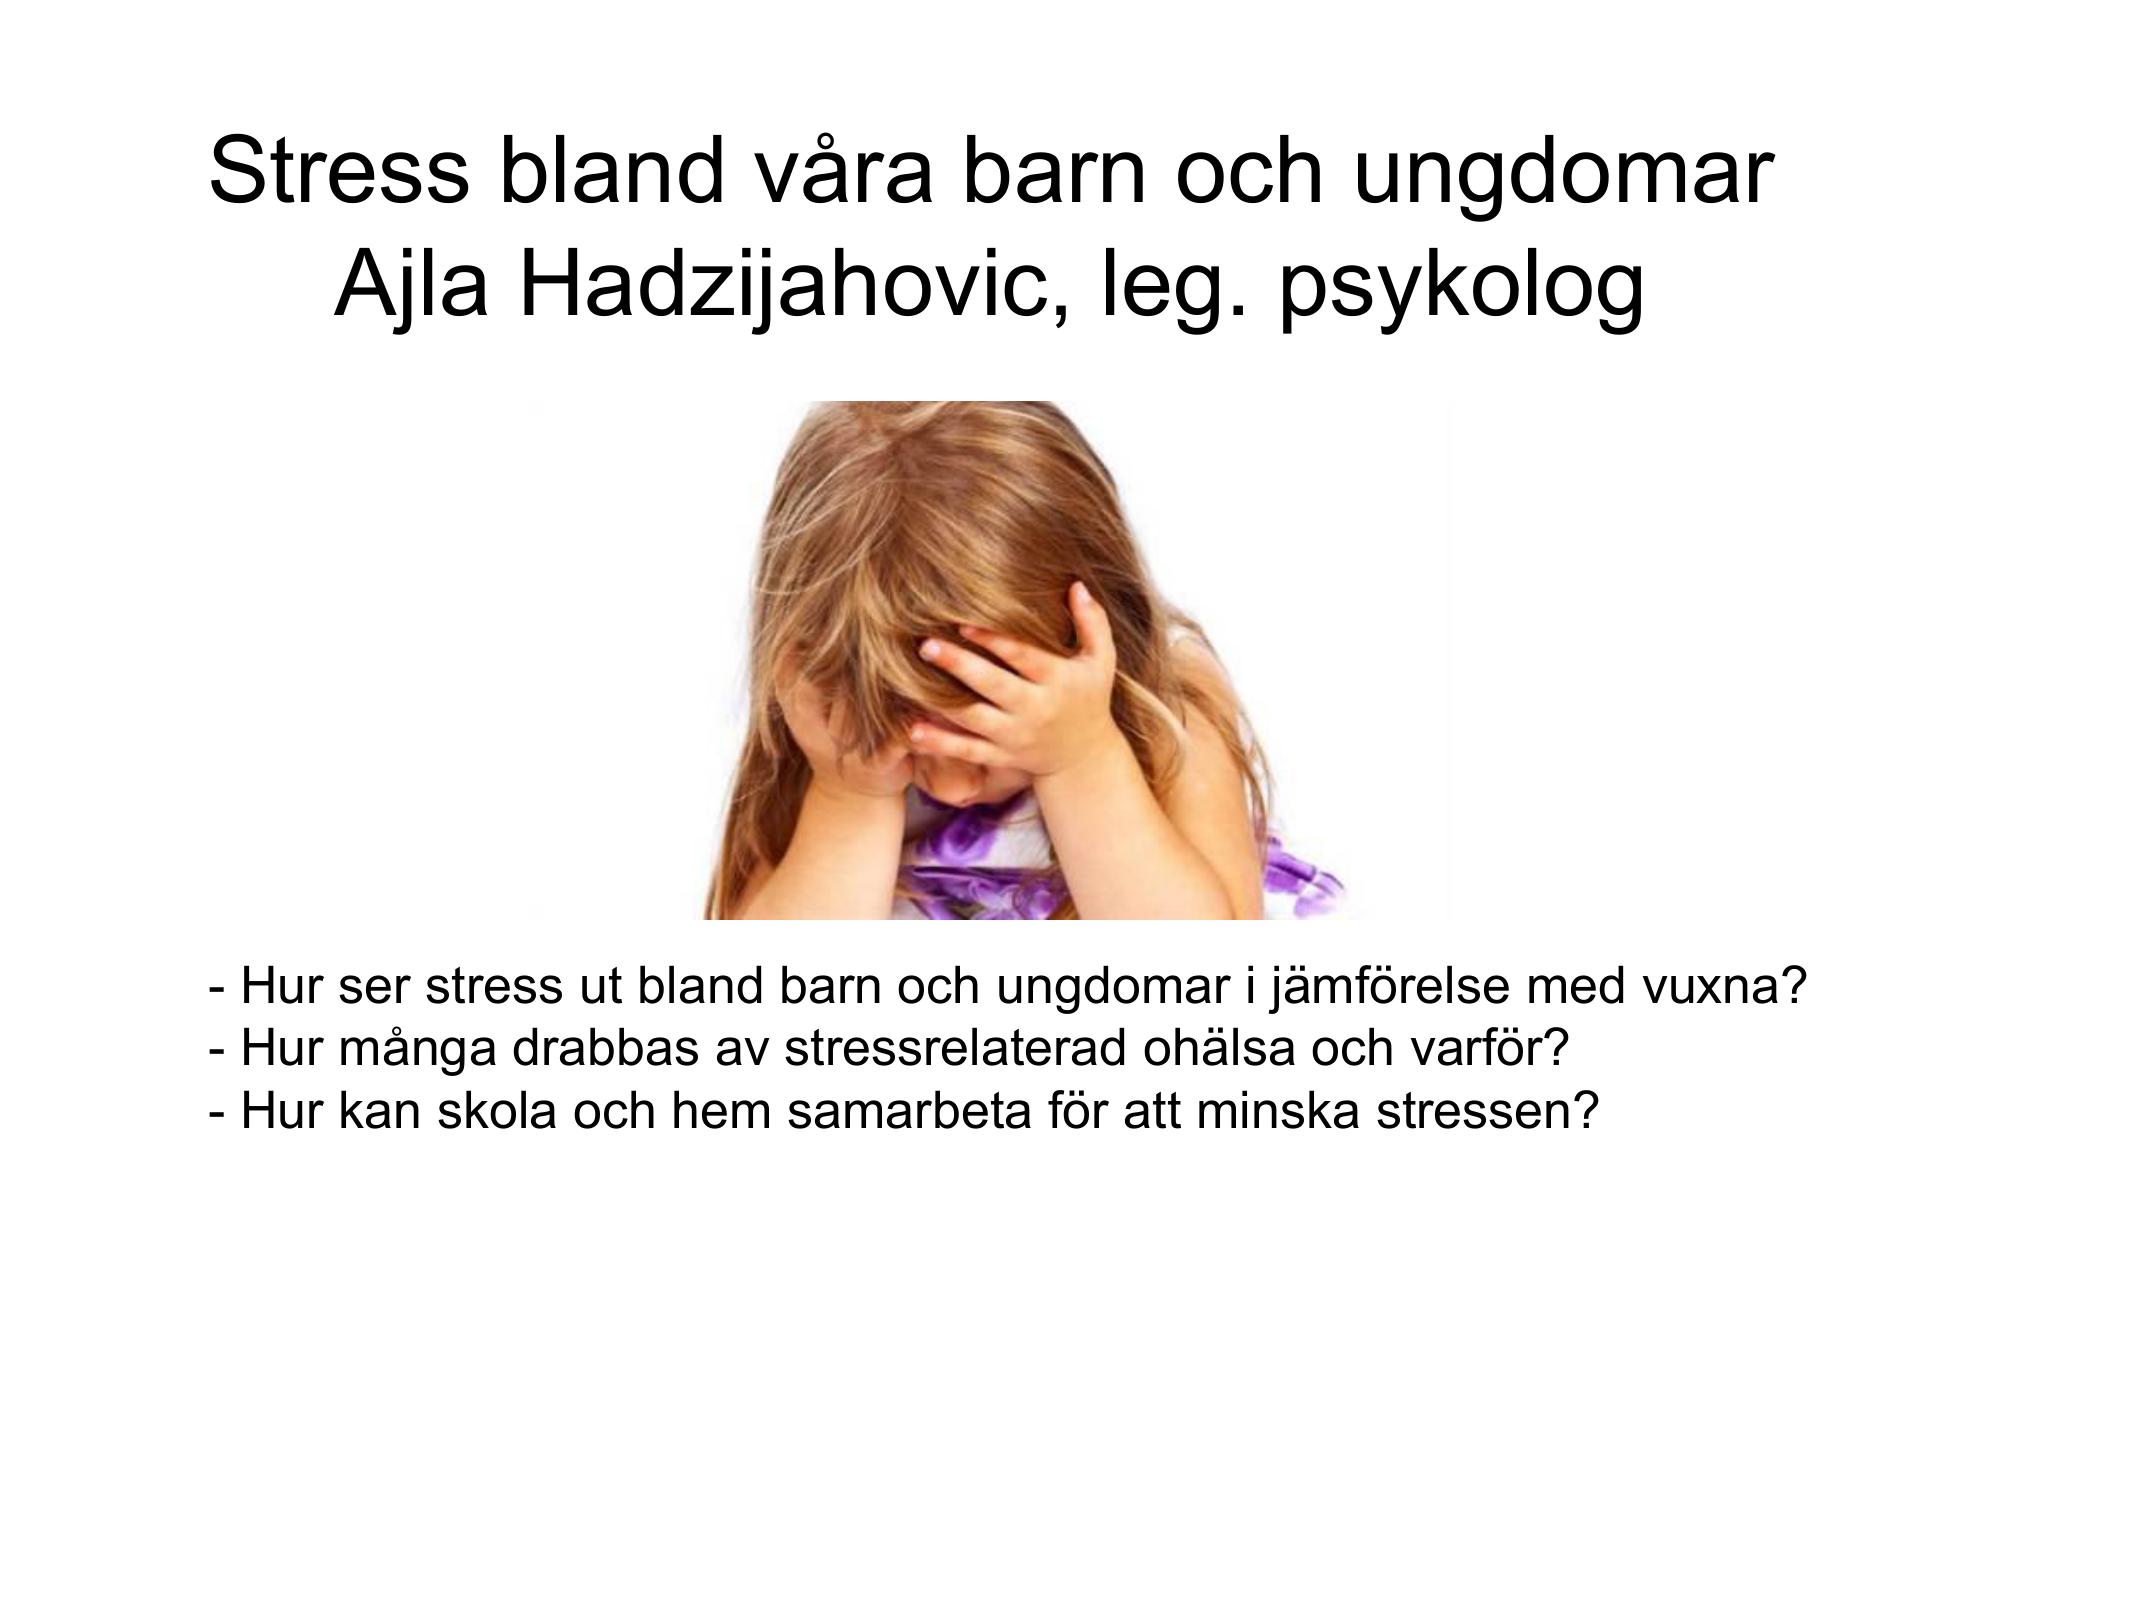 stress bland unga